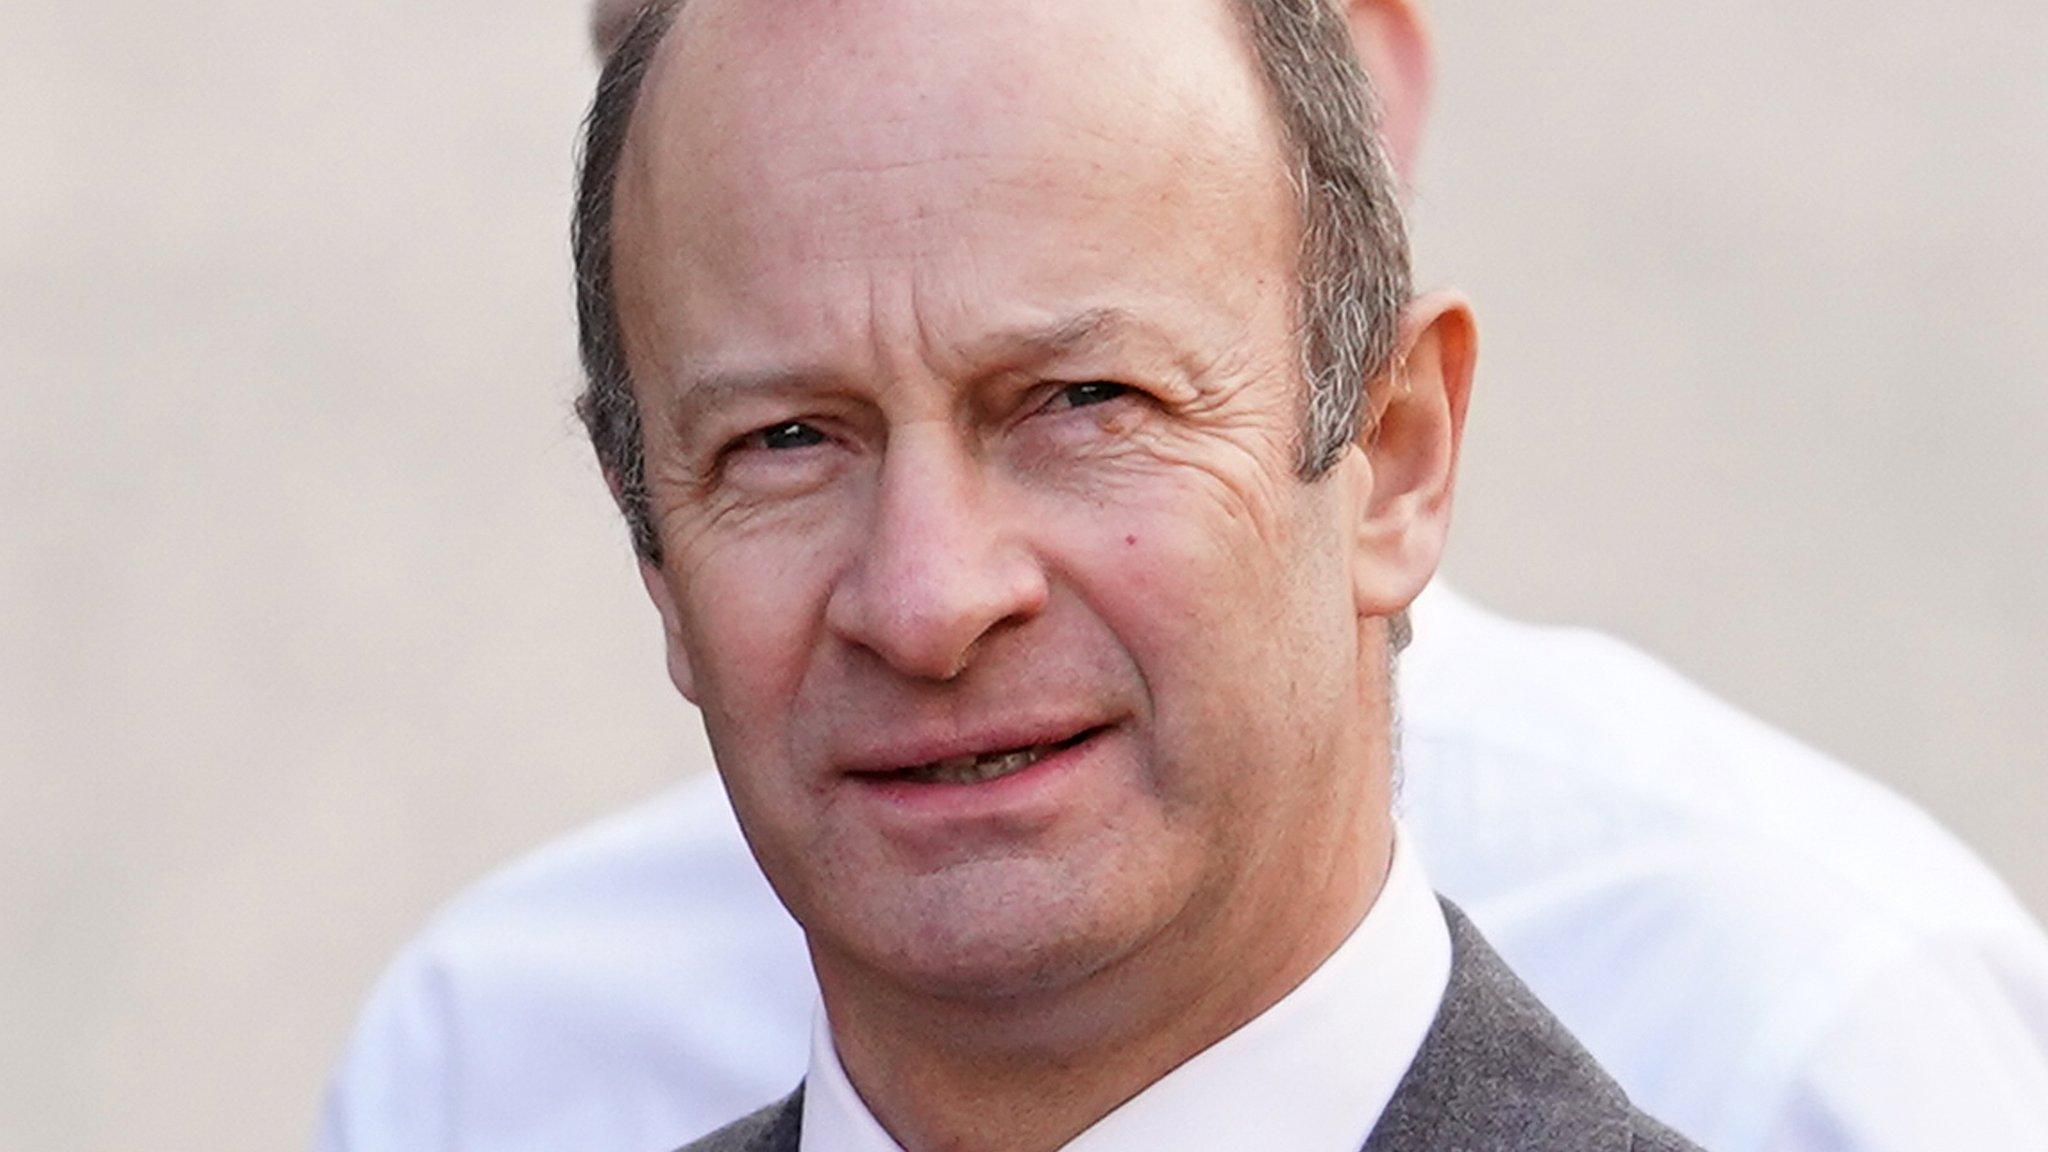 UKIP members voted to sack embattled leader Henry Bolton